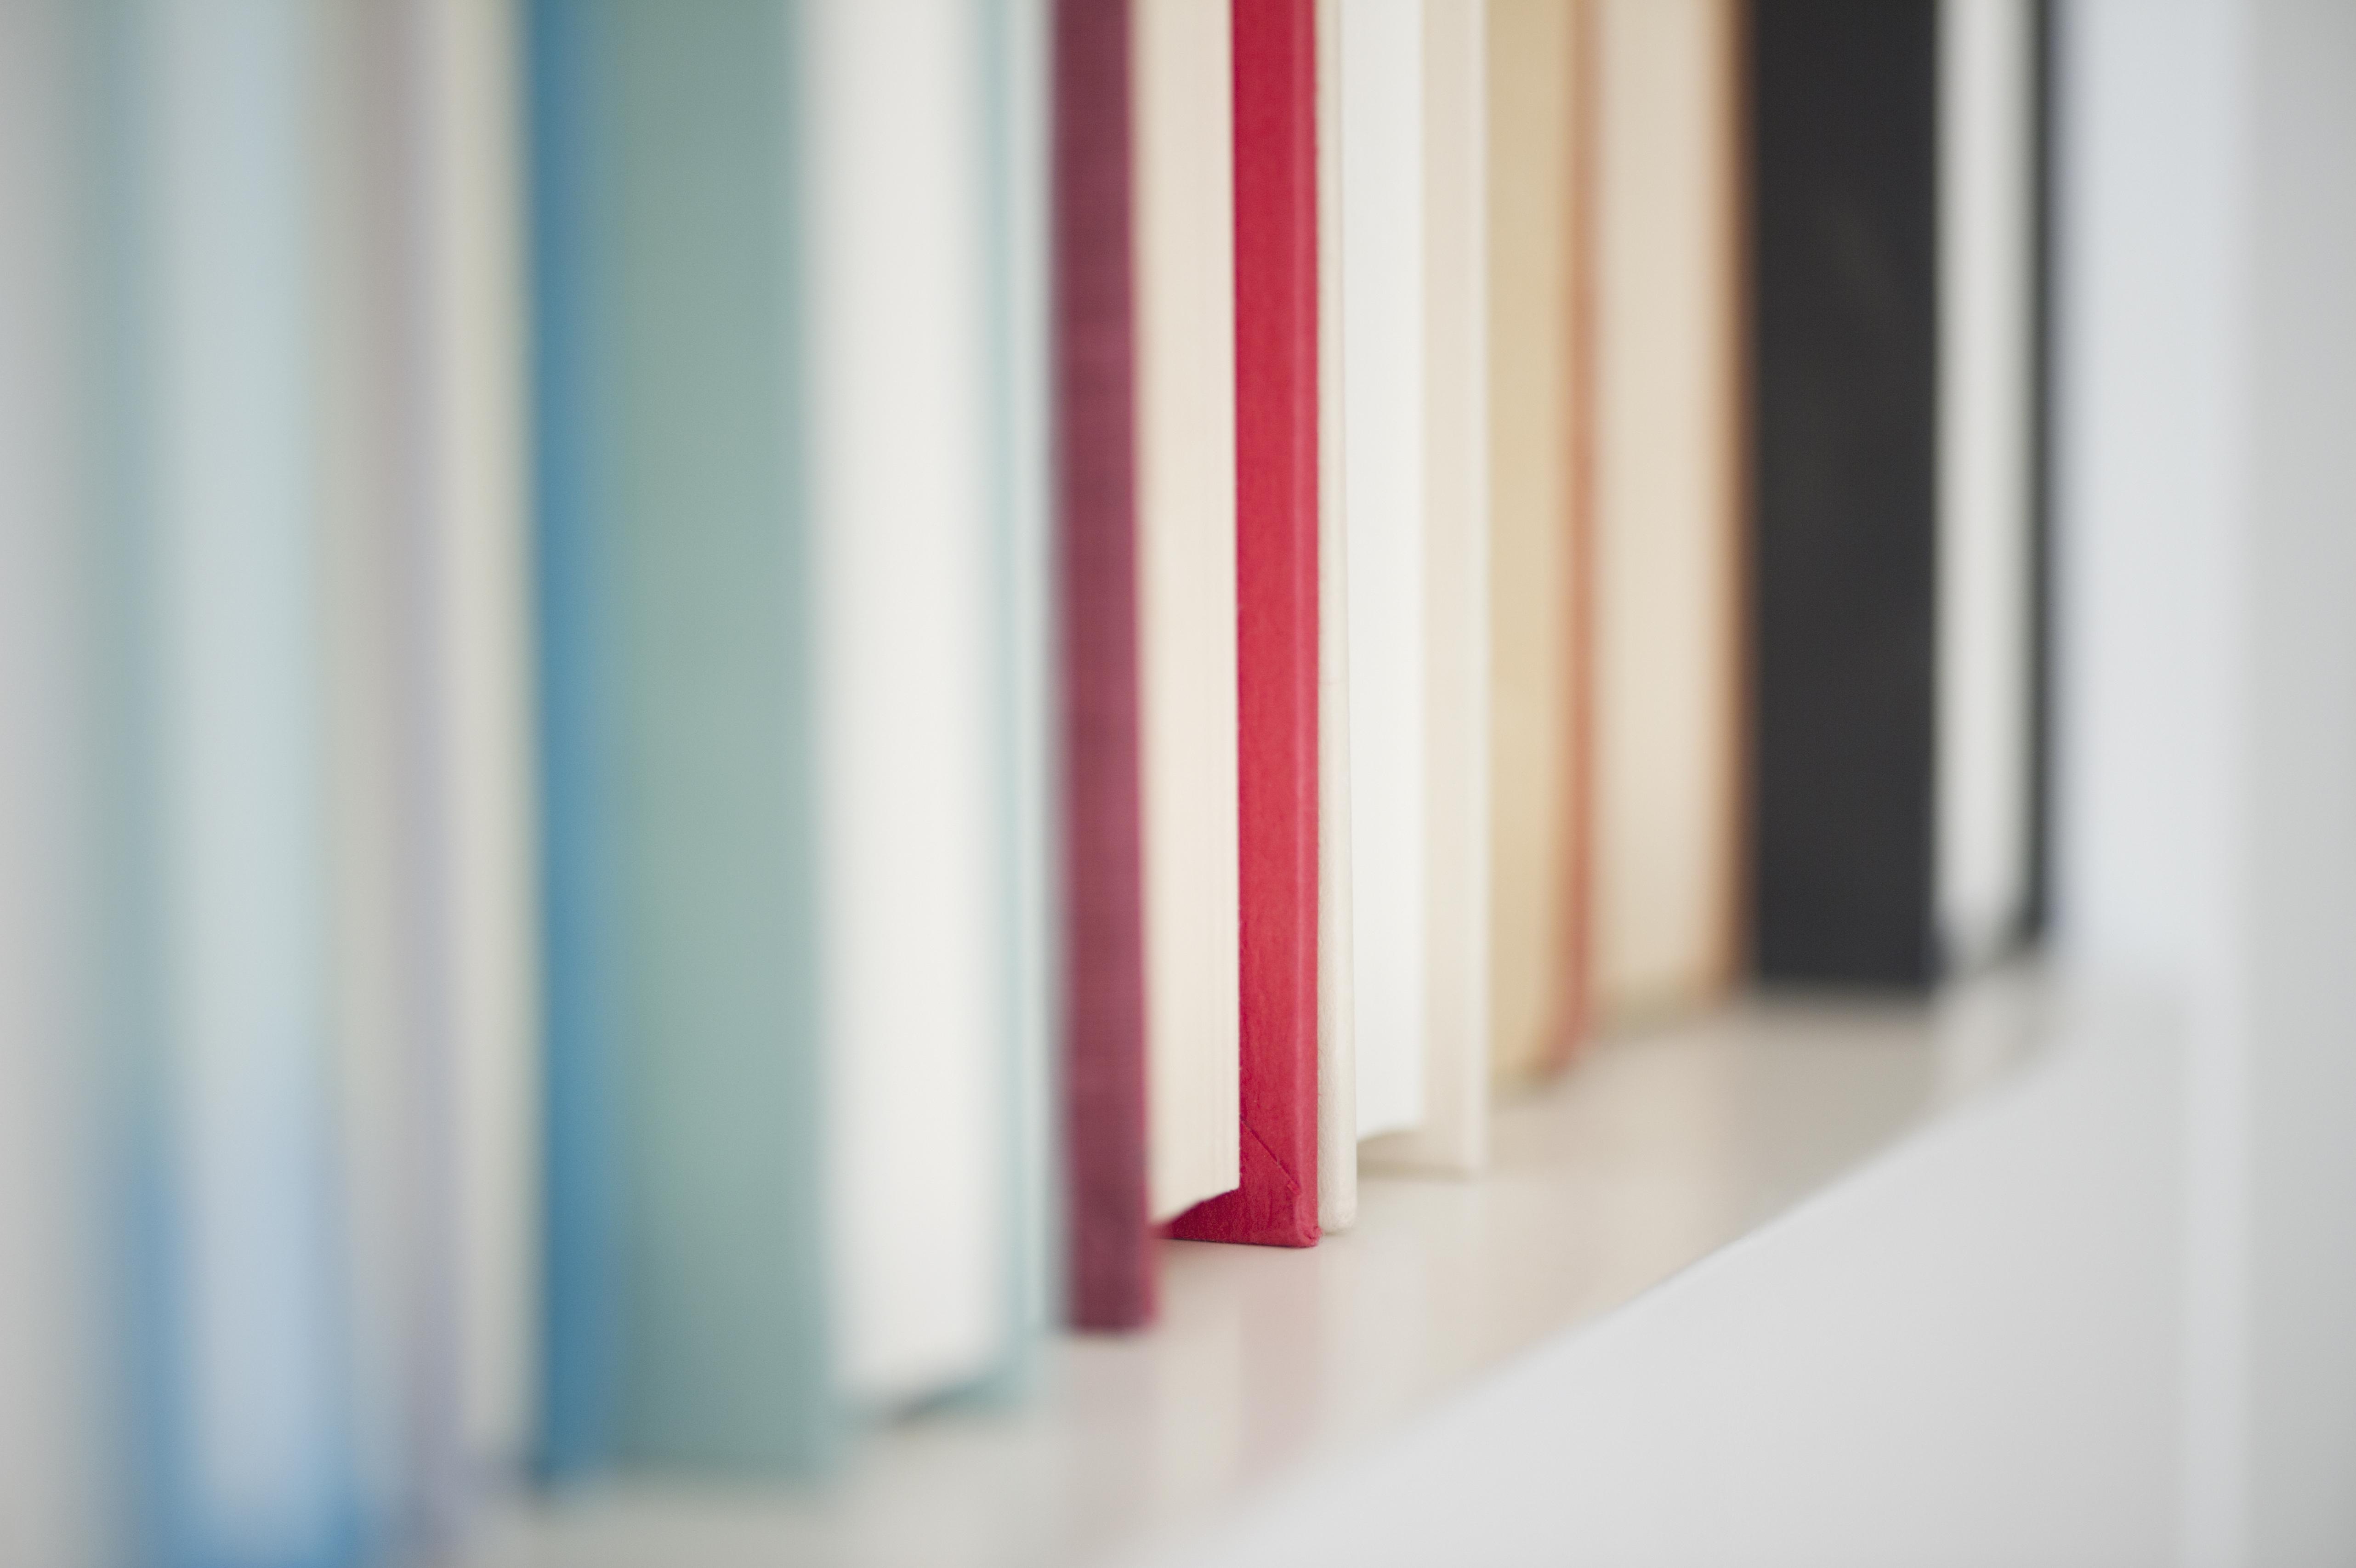 USA, New Jersey, Jersey City, Books on shelf